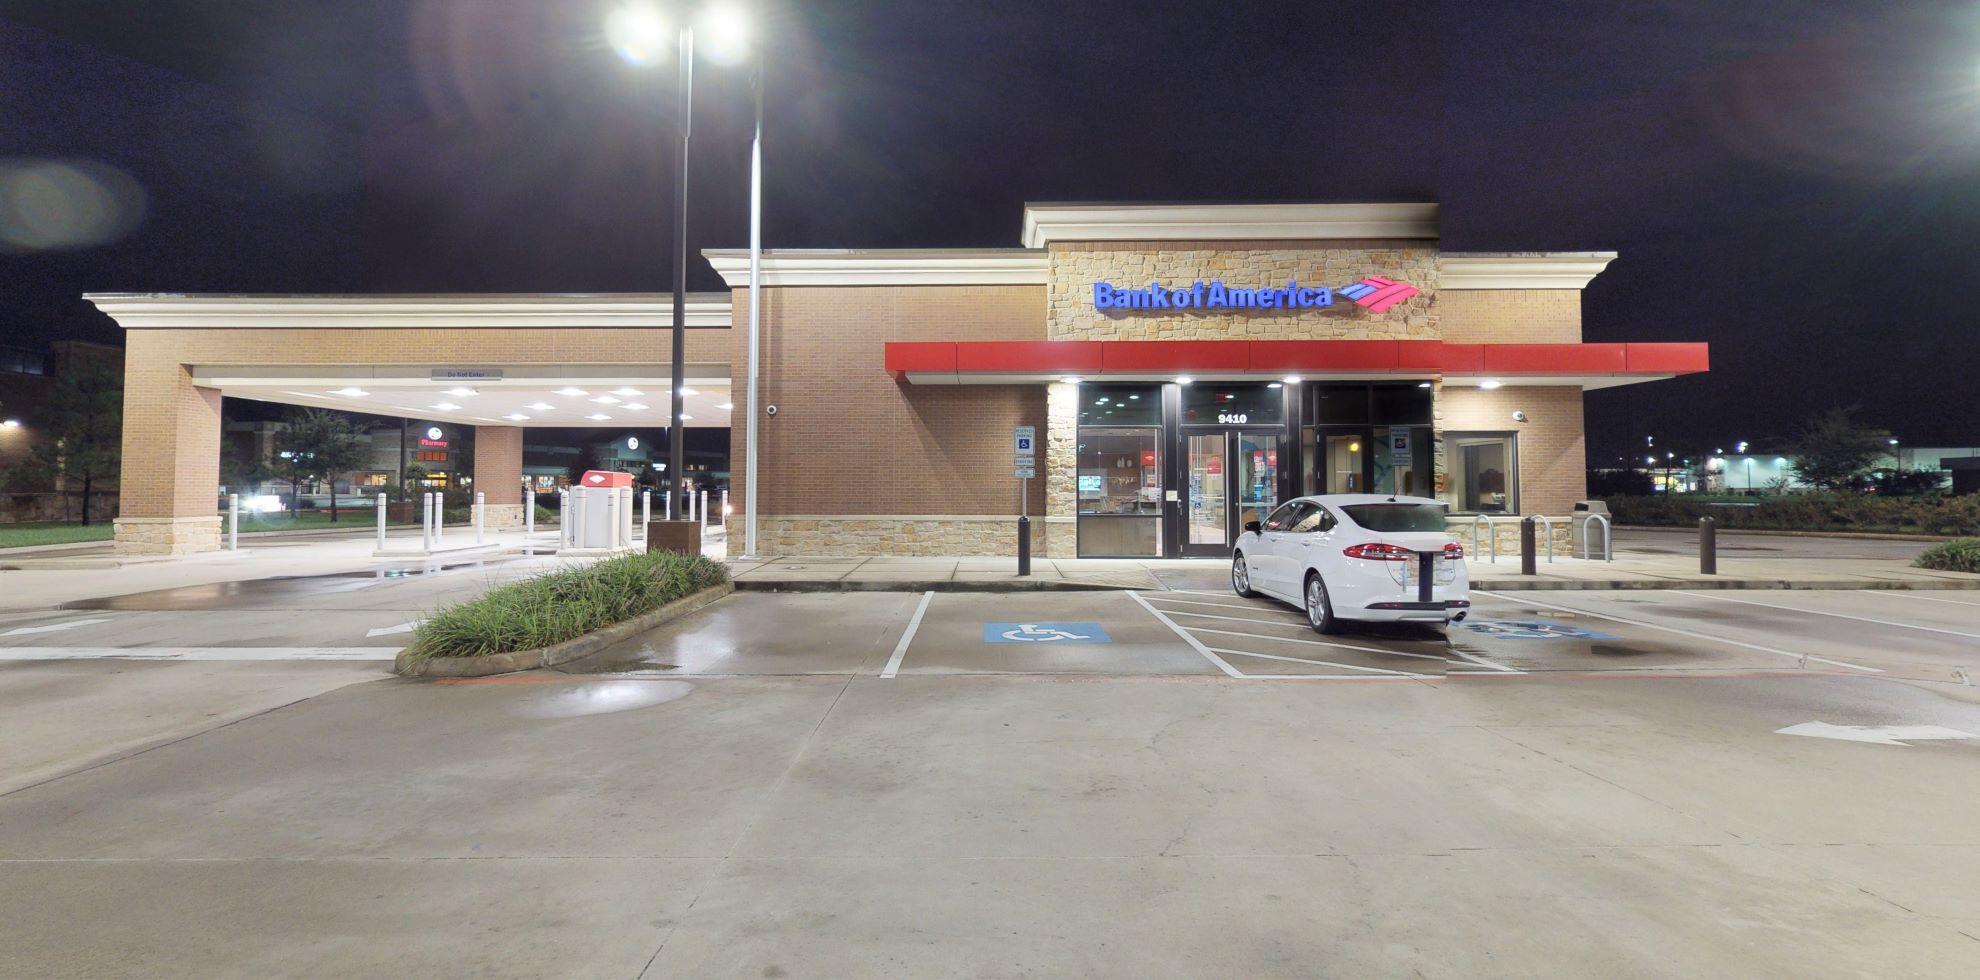 Bank of America financial center with drive-thru ATM | 9410 Spring Green Blvd, Katy, TX 77494